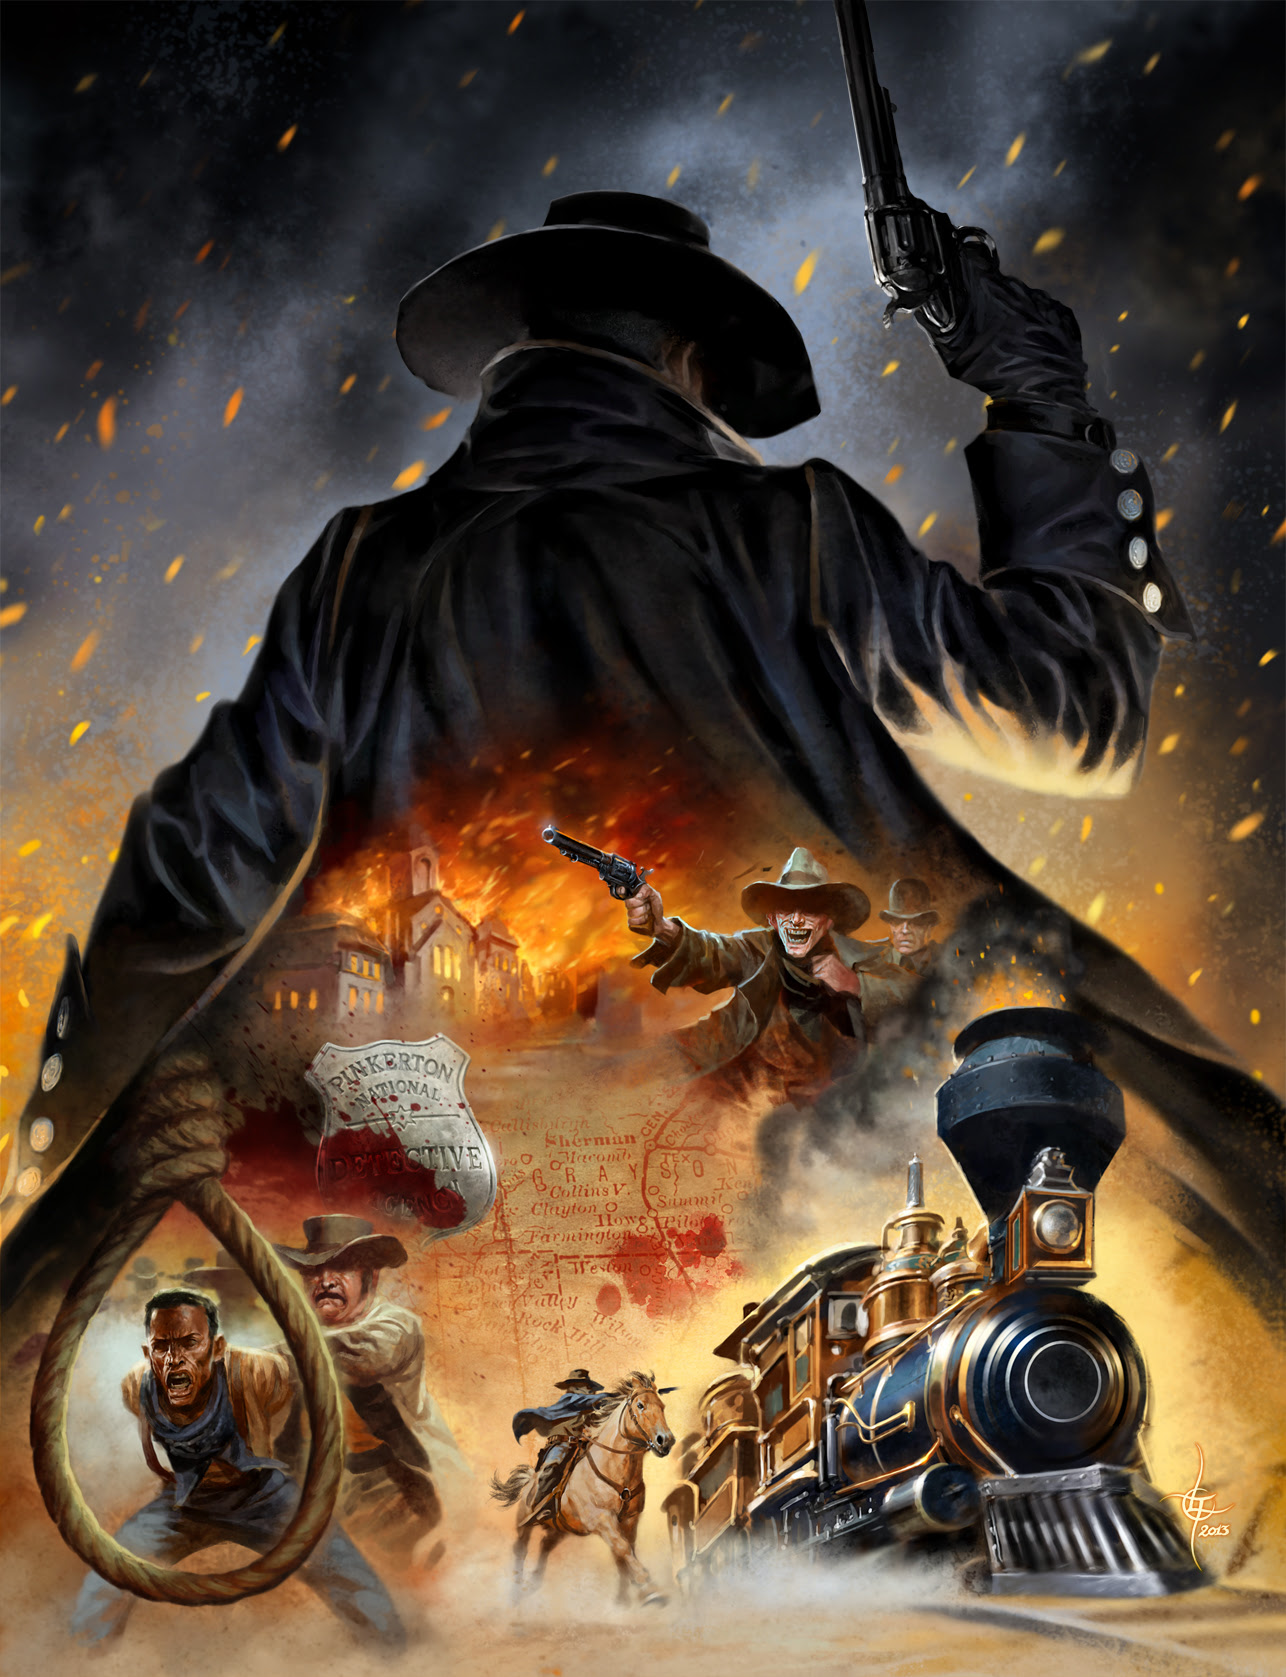 lukas thelin, 2013, western rpg, mannen i svart, the man in black, adventure, hell on wheels, train robbery, black hero